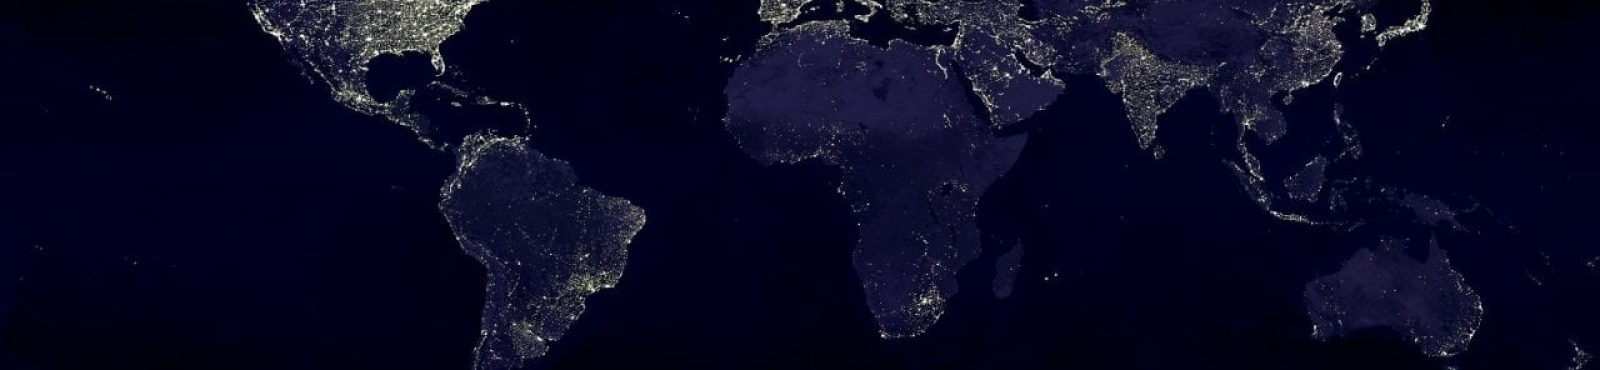 earth-earth-at-night-night-lights-41949-1280x640